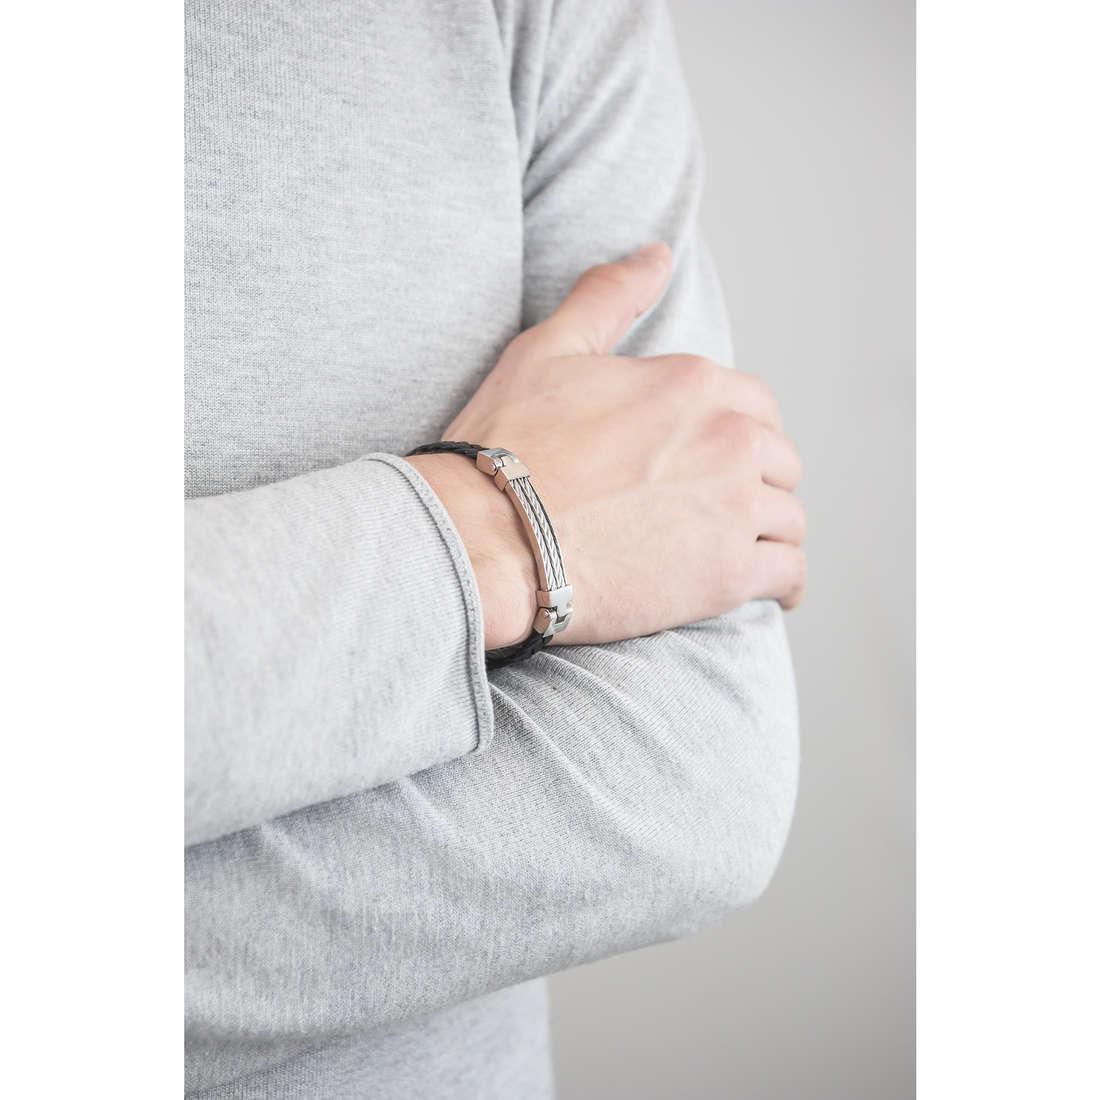 Sector bracciali Impact uomo SLI37 indosso